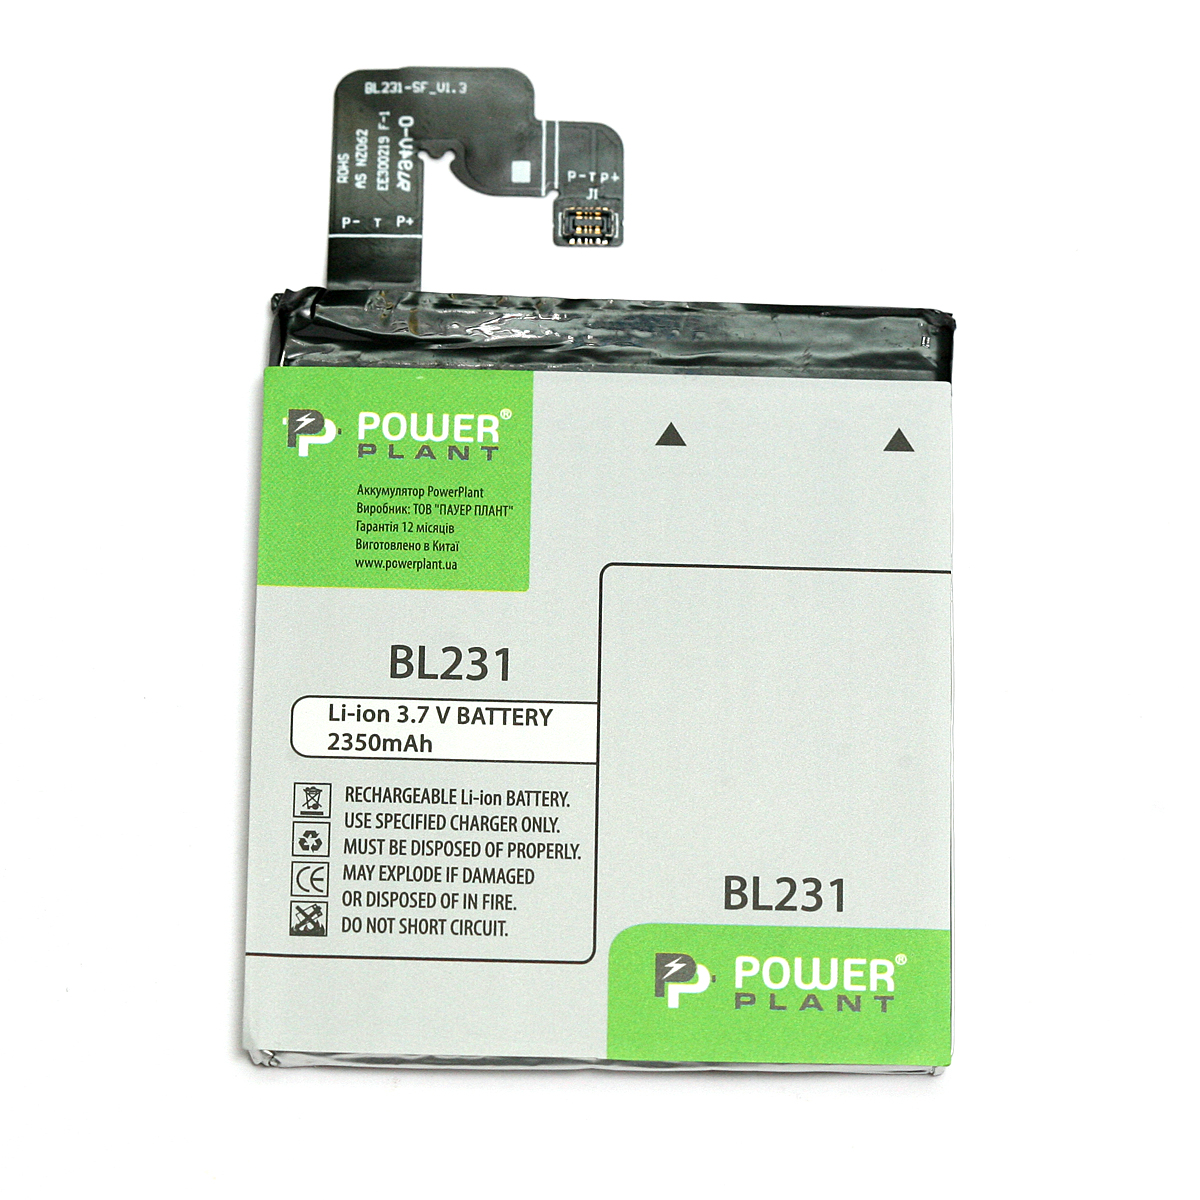 Купить Аккумулятор PowerPlant Lenovo VIBE X2 (BL231) 2350mAh